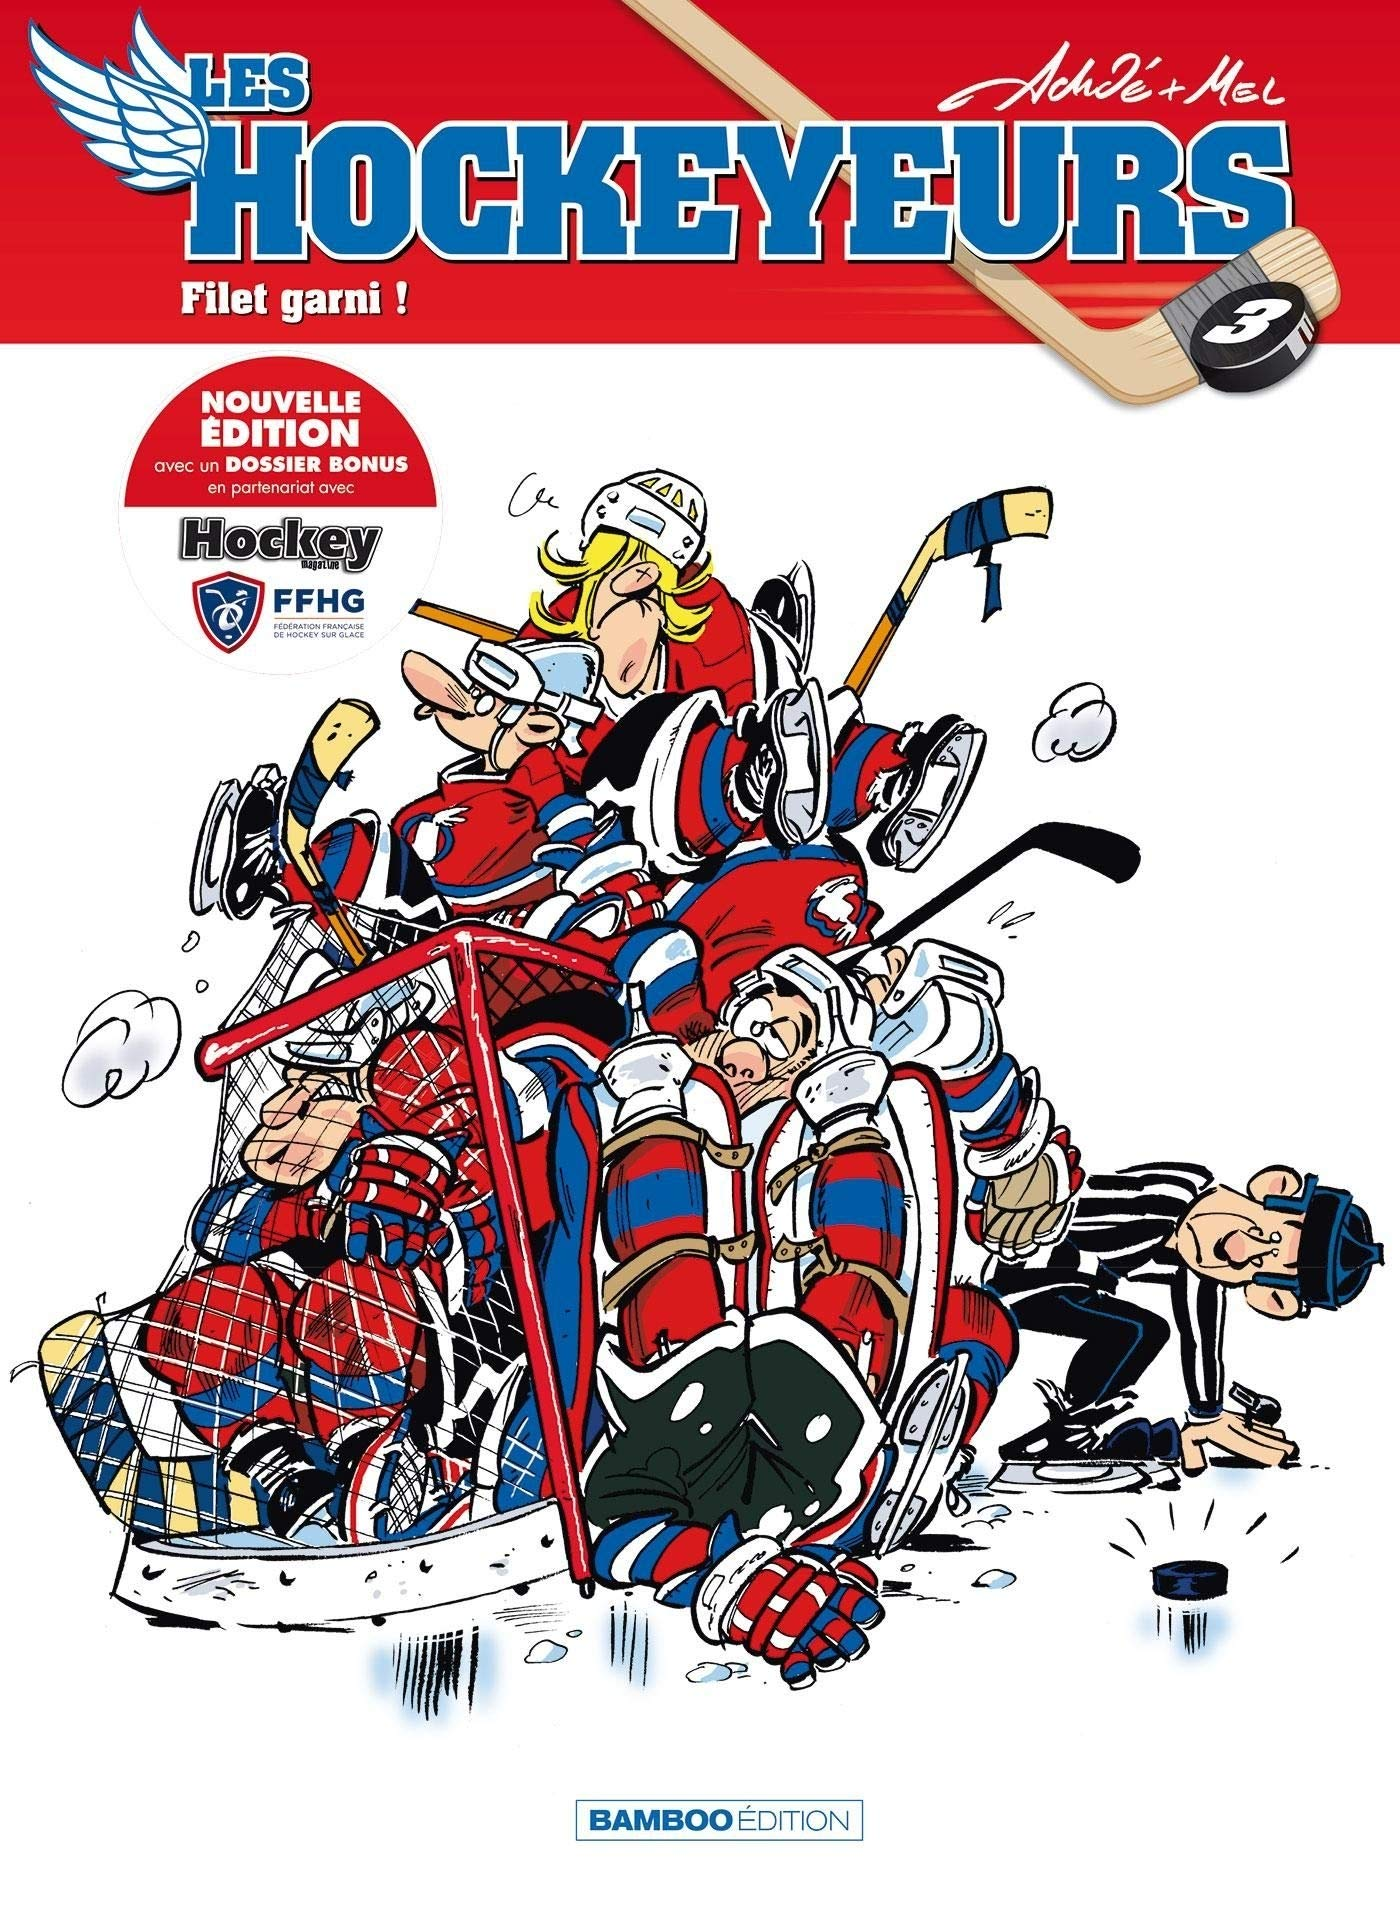 Les hockeyeurs 3